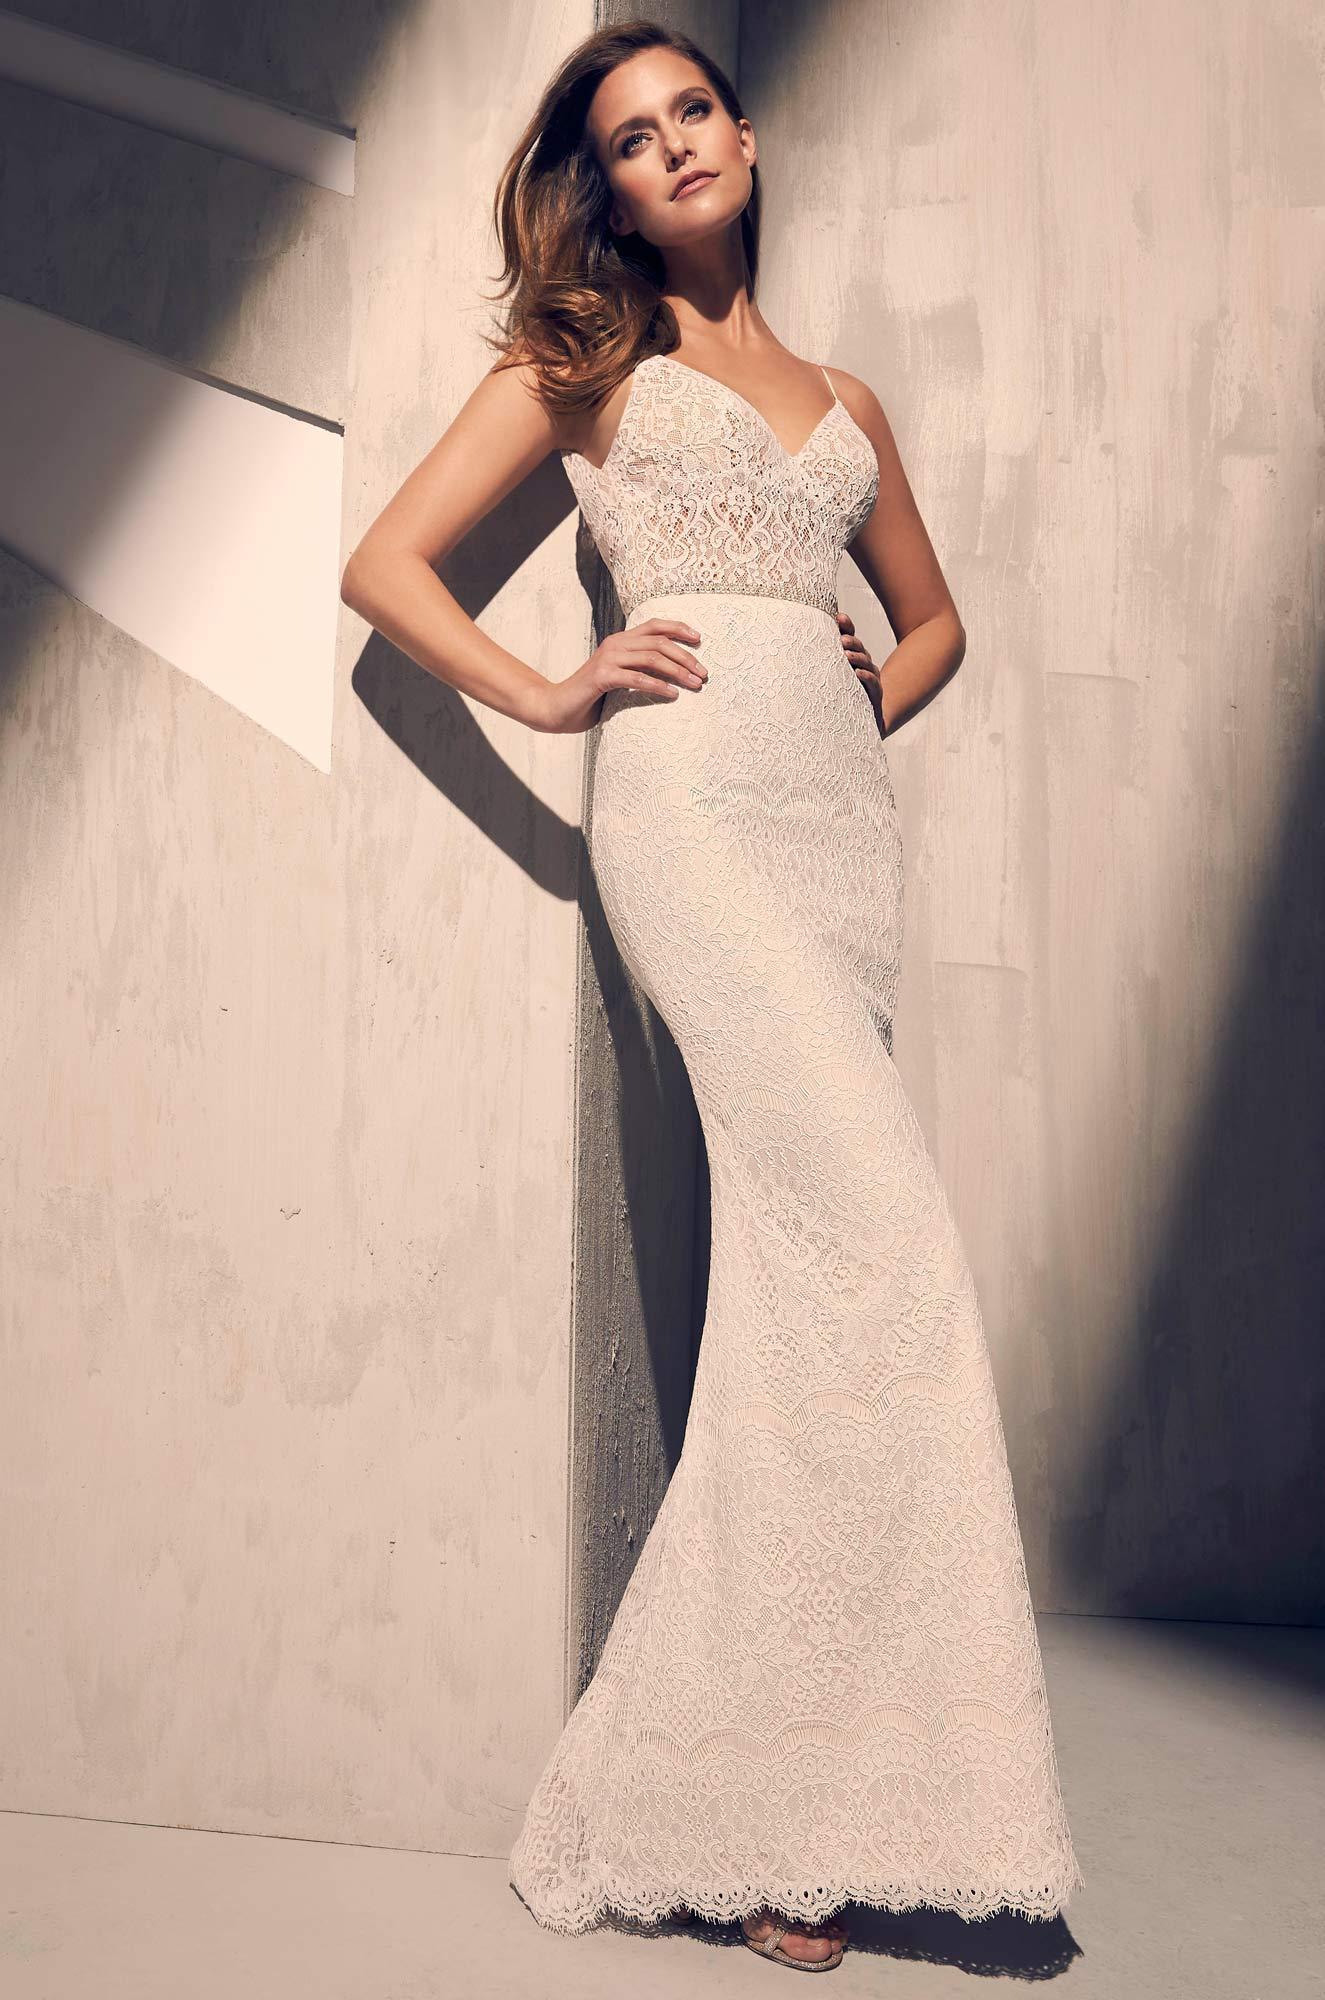 Ornate Lace Wedding Dress – Style #2215 | Mikaella Bridal